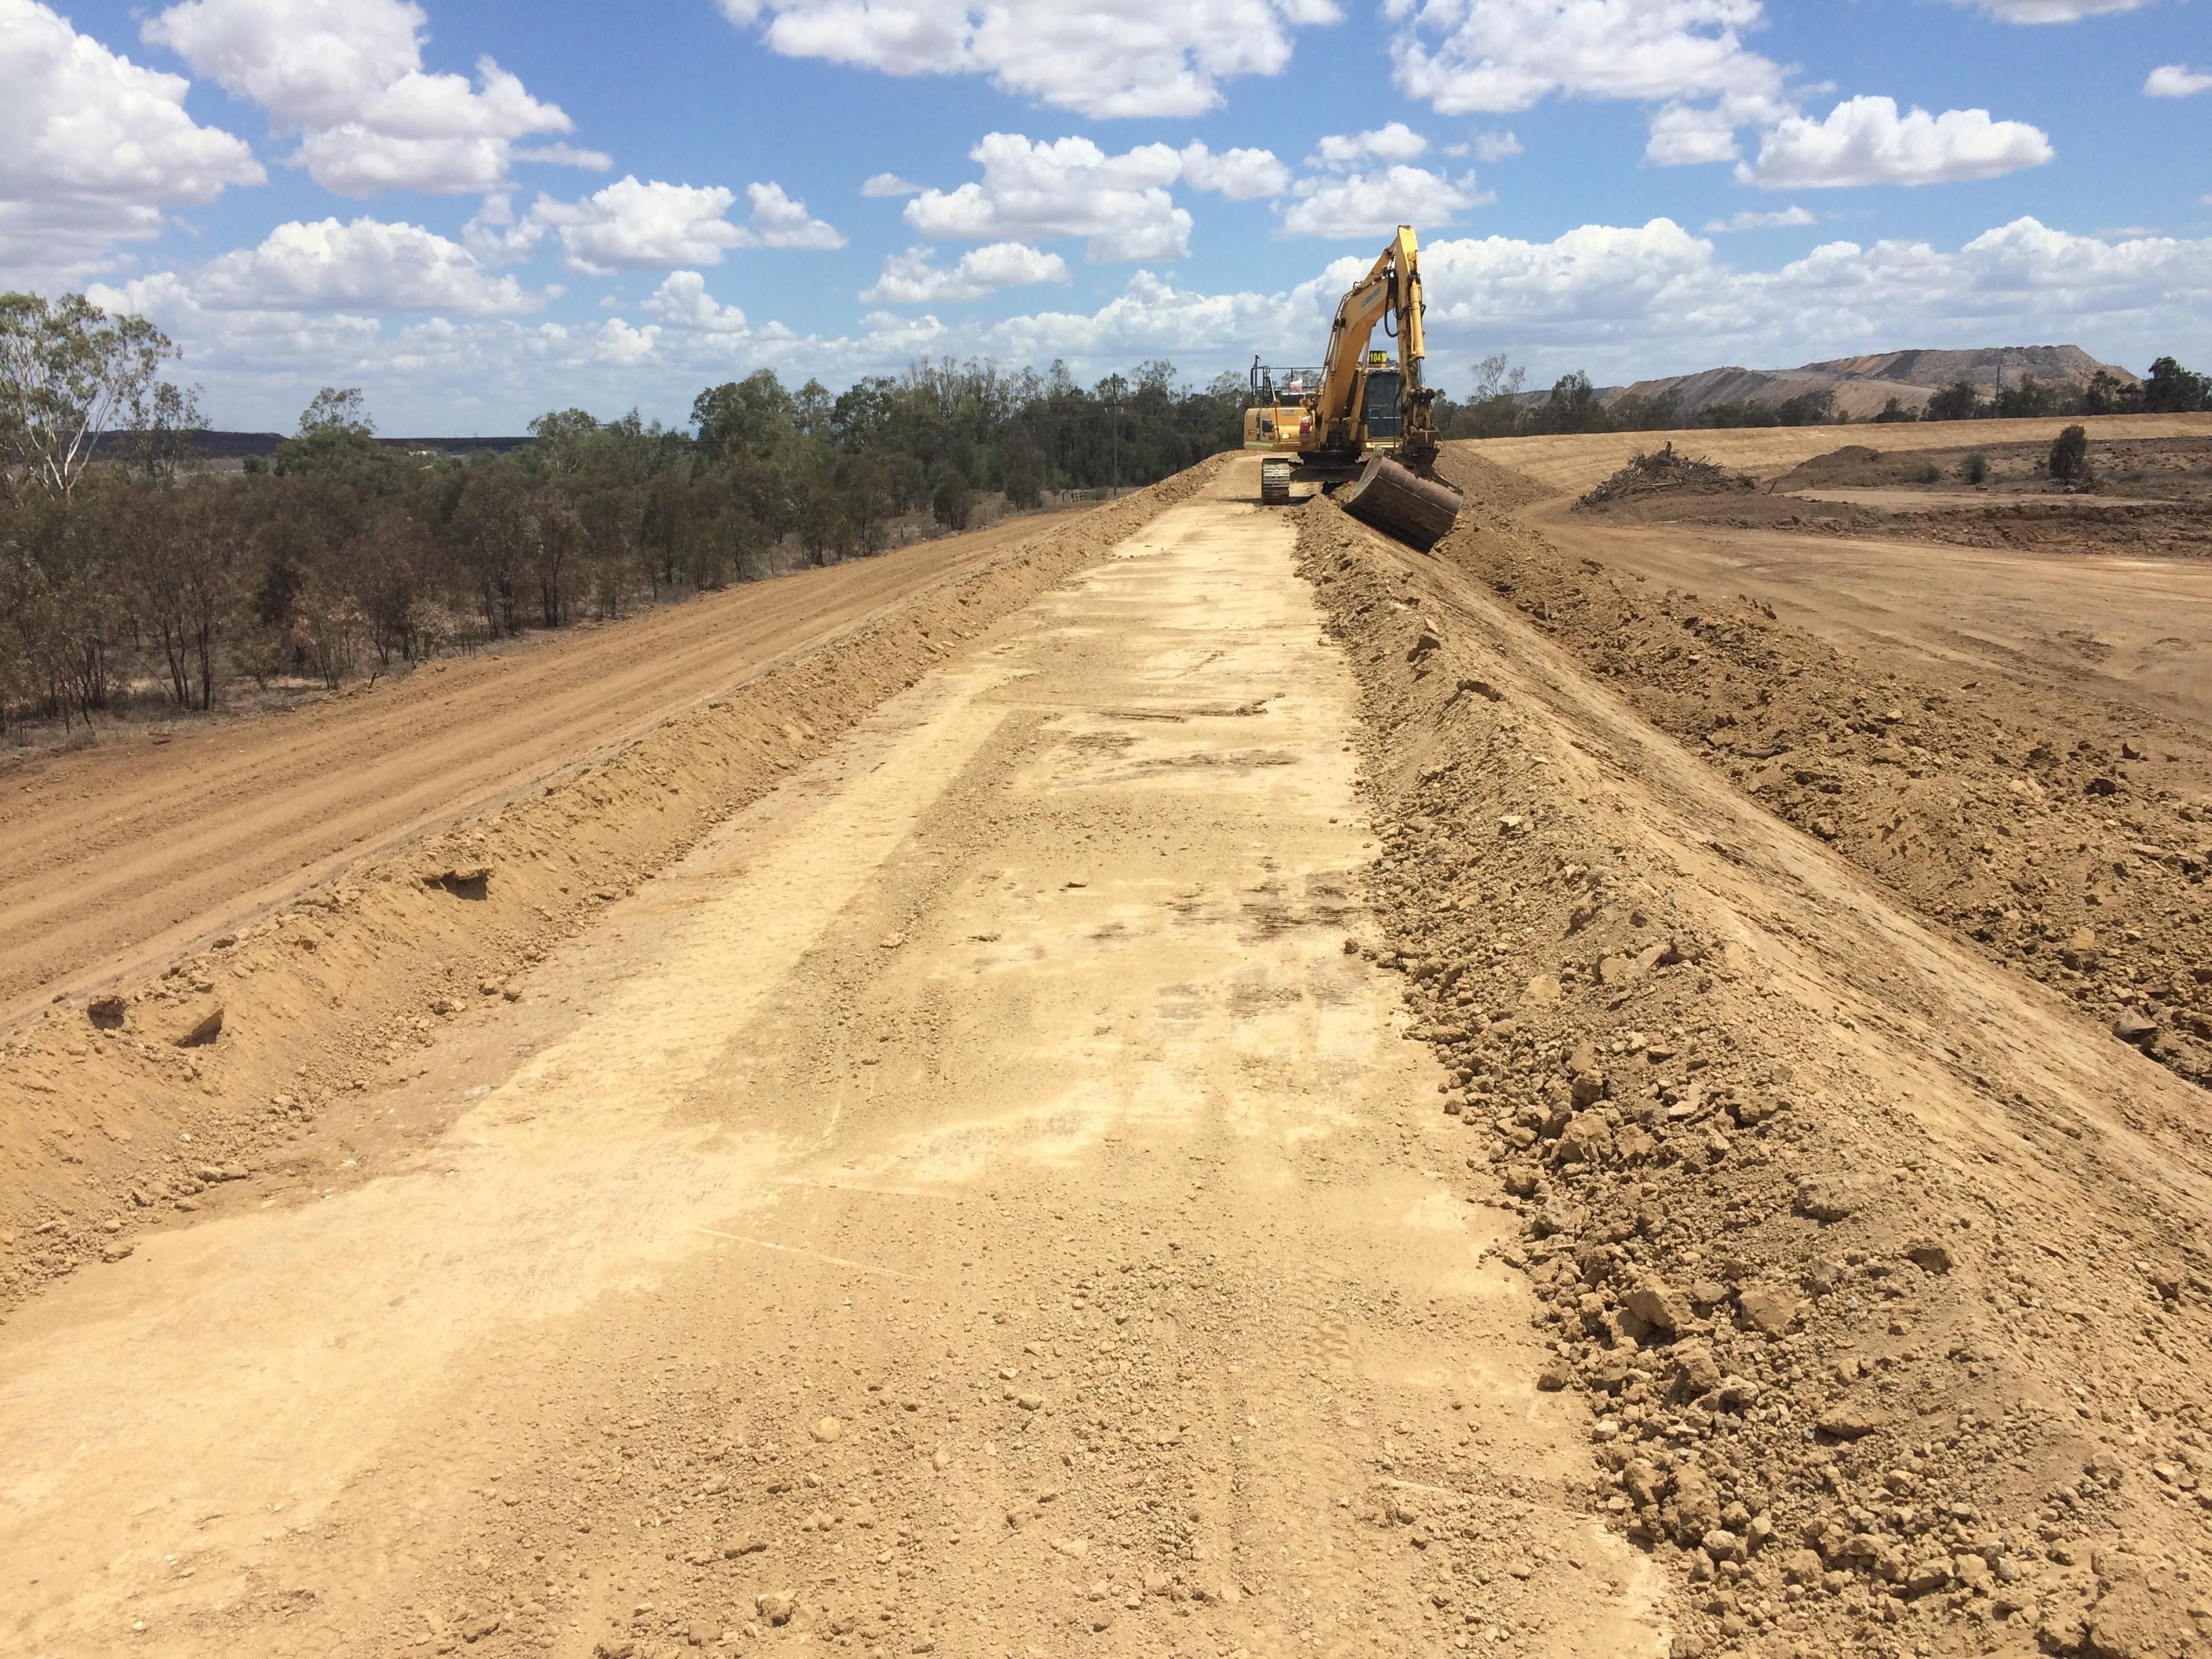 12 Mile Creek Civil Construction - Excavator on Embankment Works